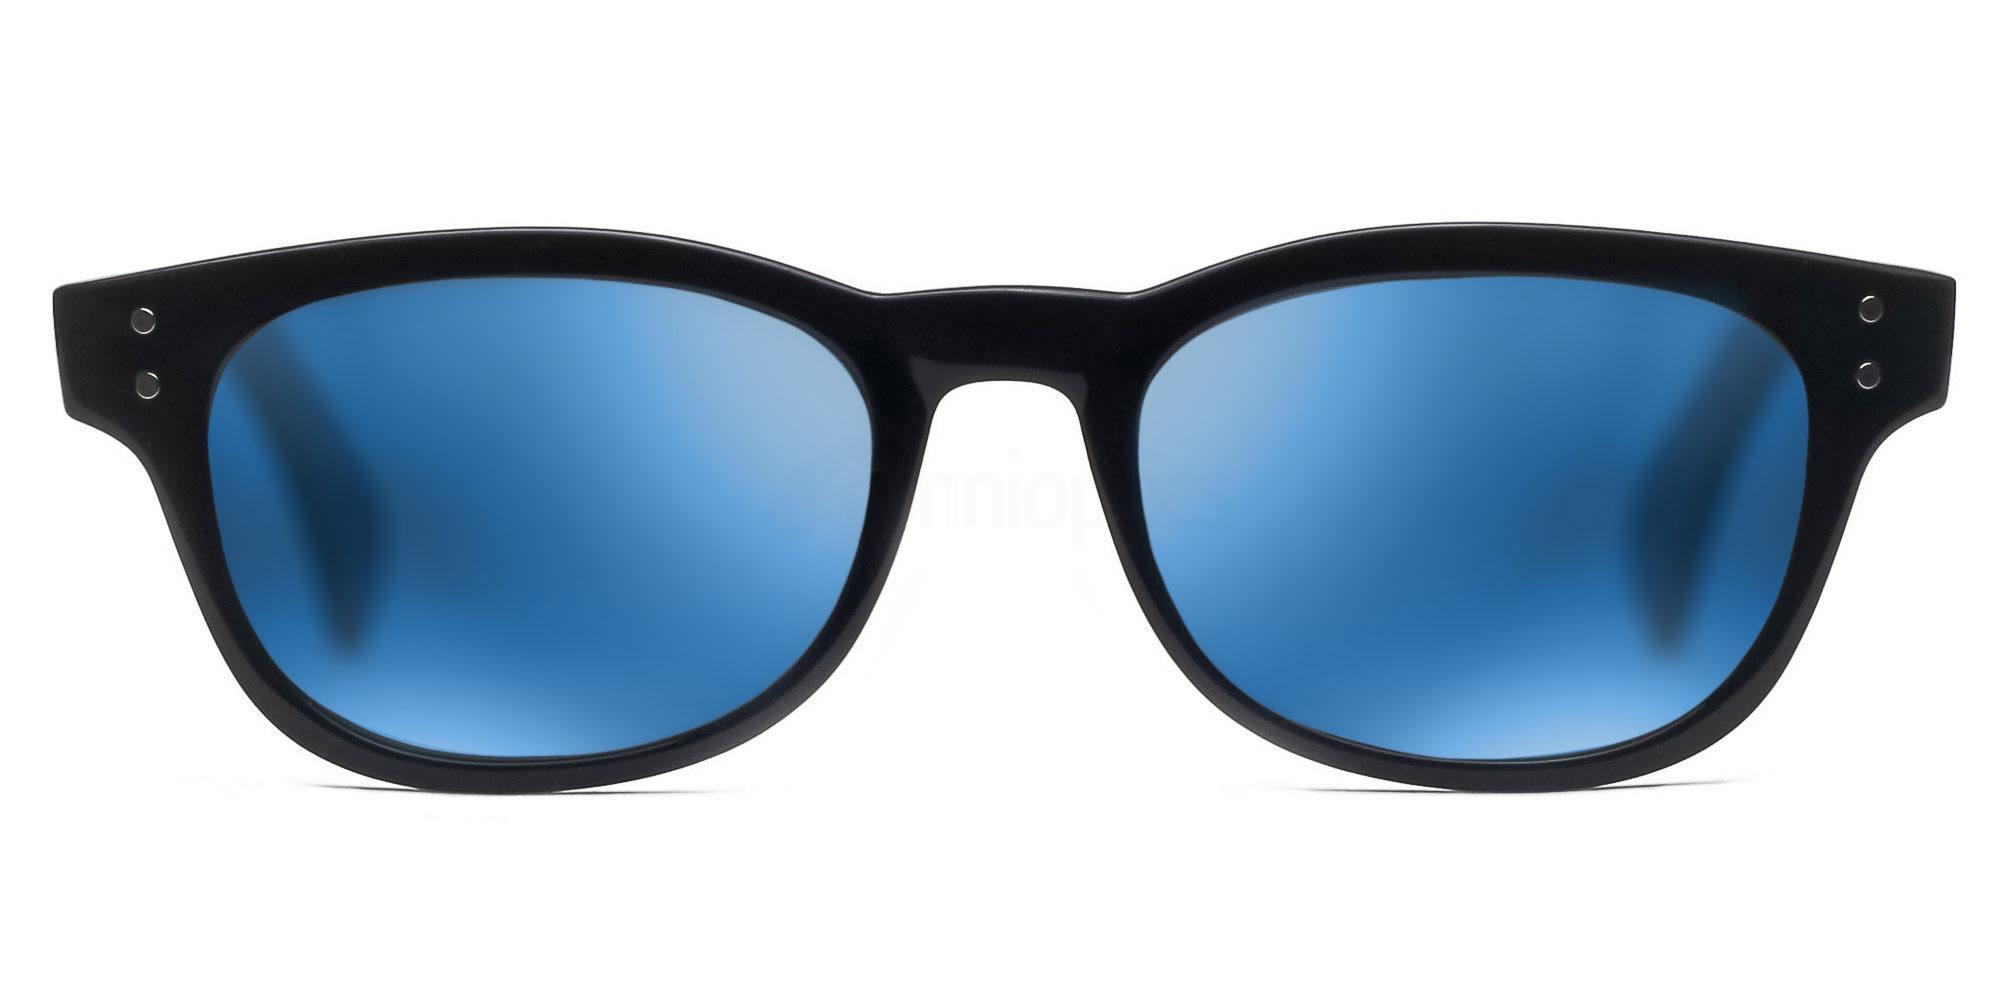 C01 Polarized Grey with Blue Mirror P2249 Shiny Black (Mirrored Polarized) , Savannah